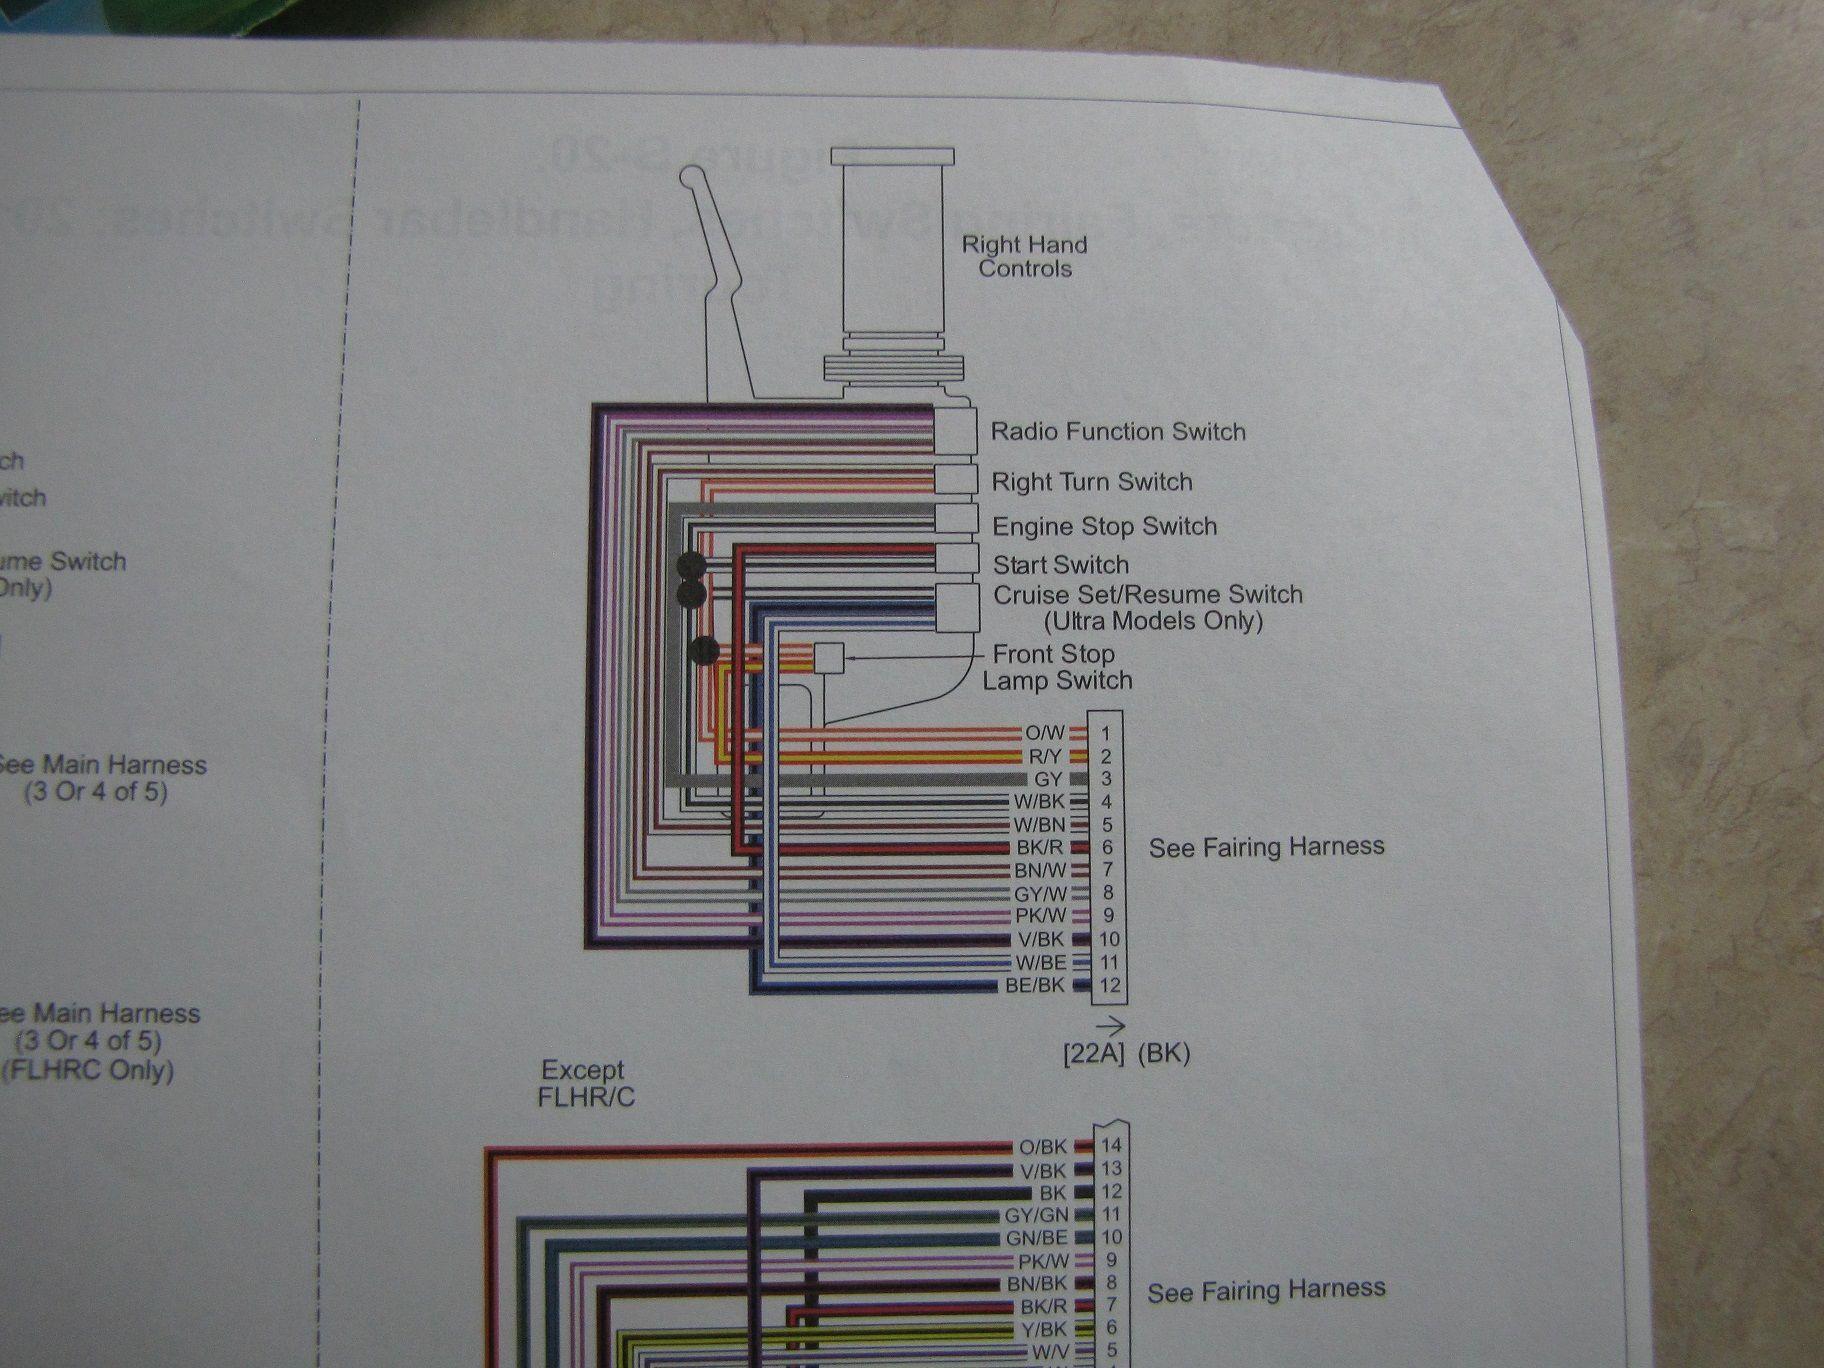 Harley Davidson Radio Wiring Diagram Luxury Harley Street Glide Radio  Wiring Diagram Wiring Diagrams | Harley davidson, Radio, Harley | Wiring Diagram For Harley Davidson Radio |  | Pinterest